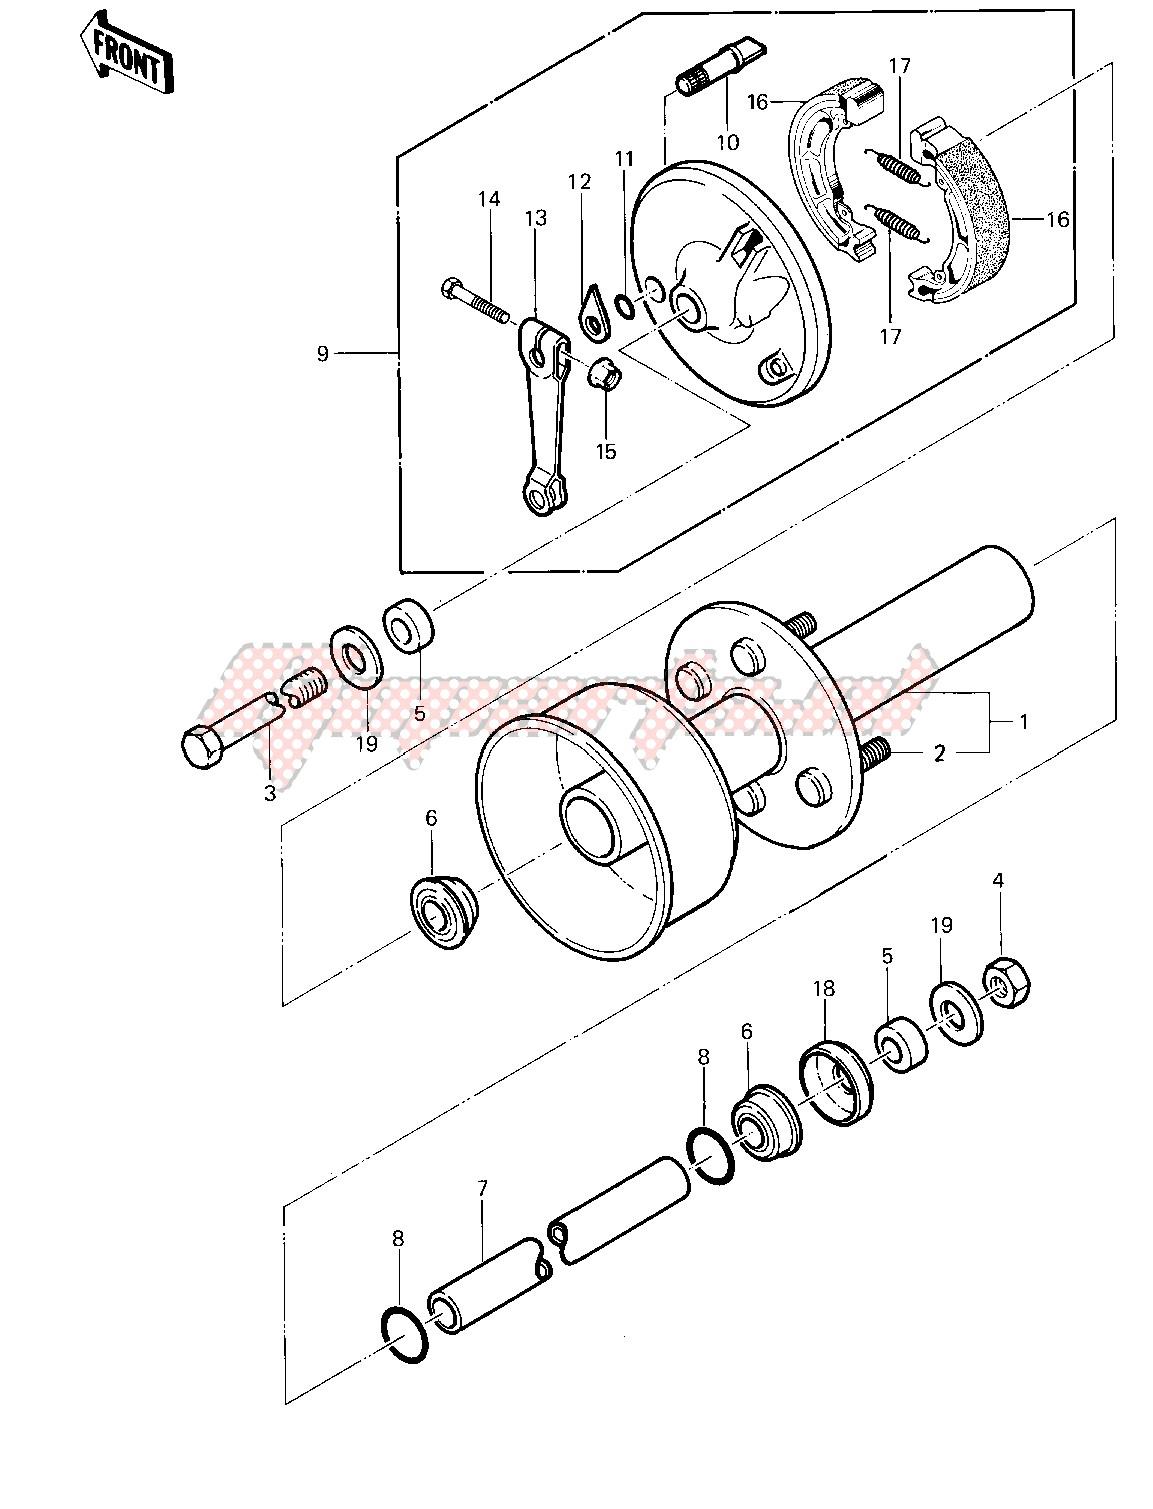 FRONT HUB_BRAKE -- 83 KLT200-A4_A4A- - image